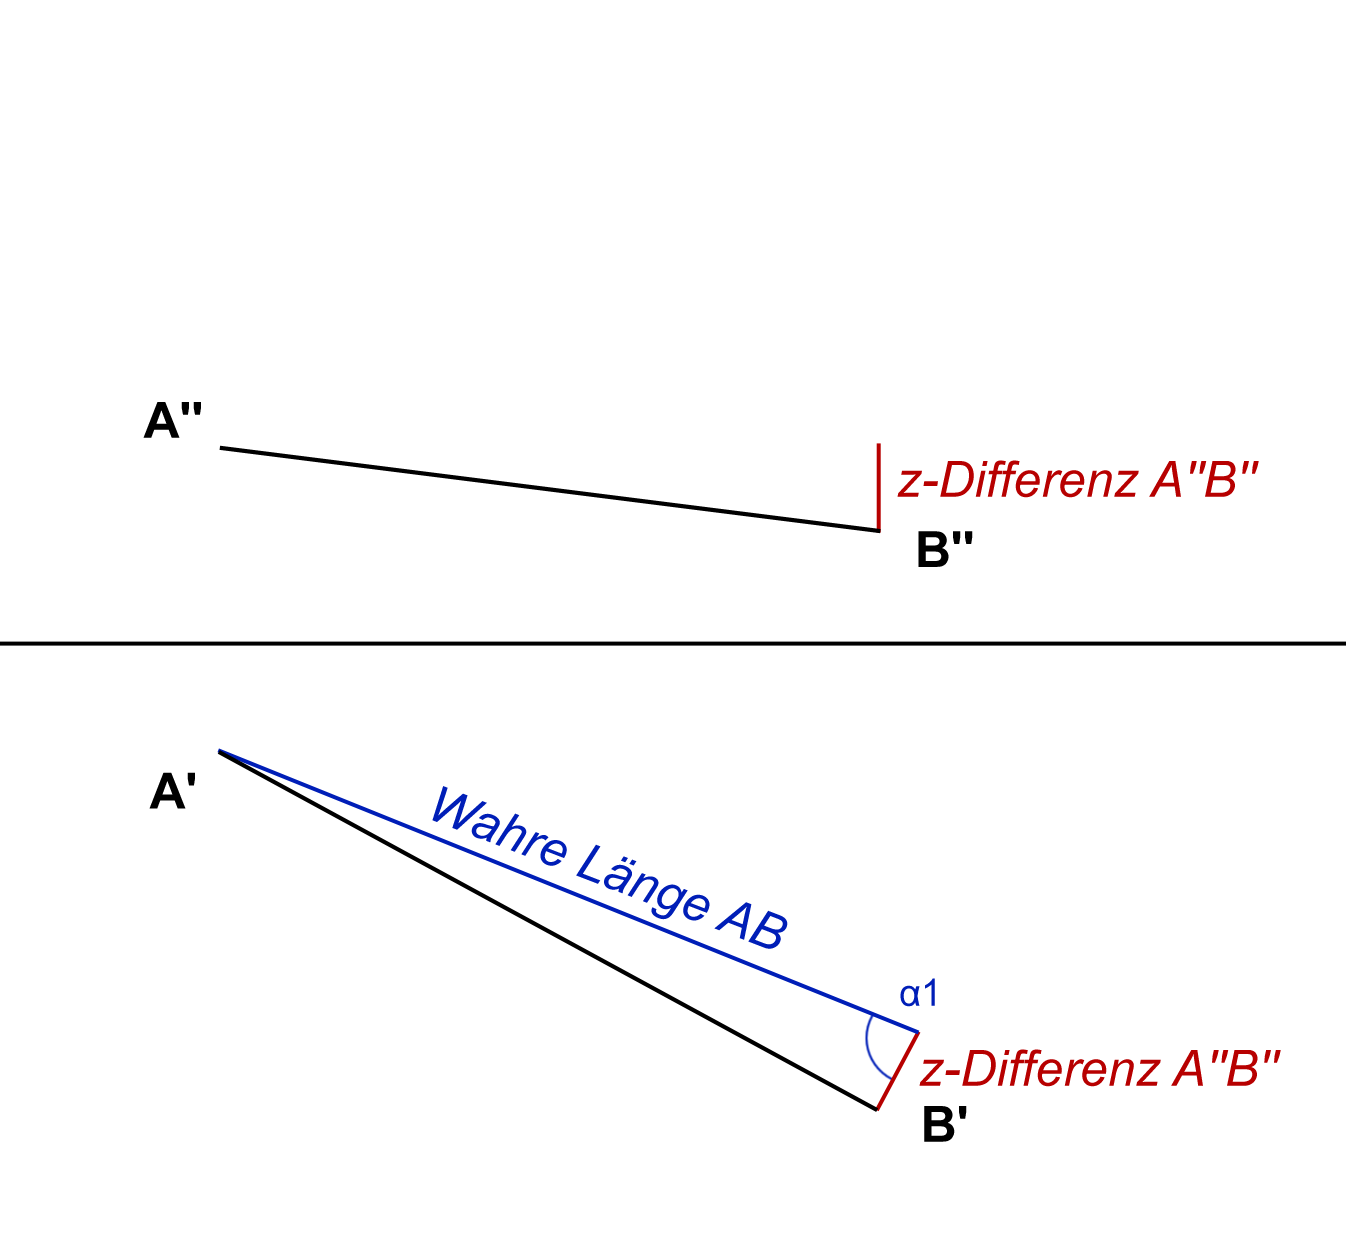 Spurdreieck (darstellende Geometrie